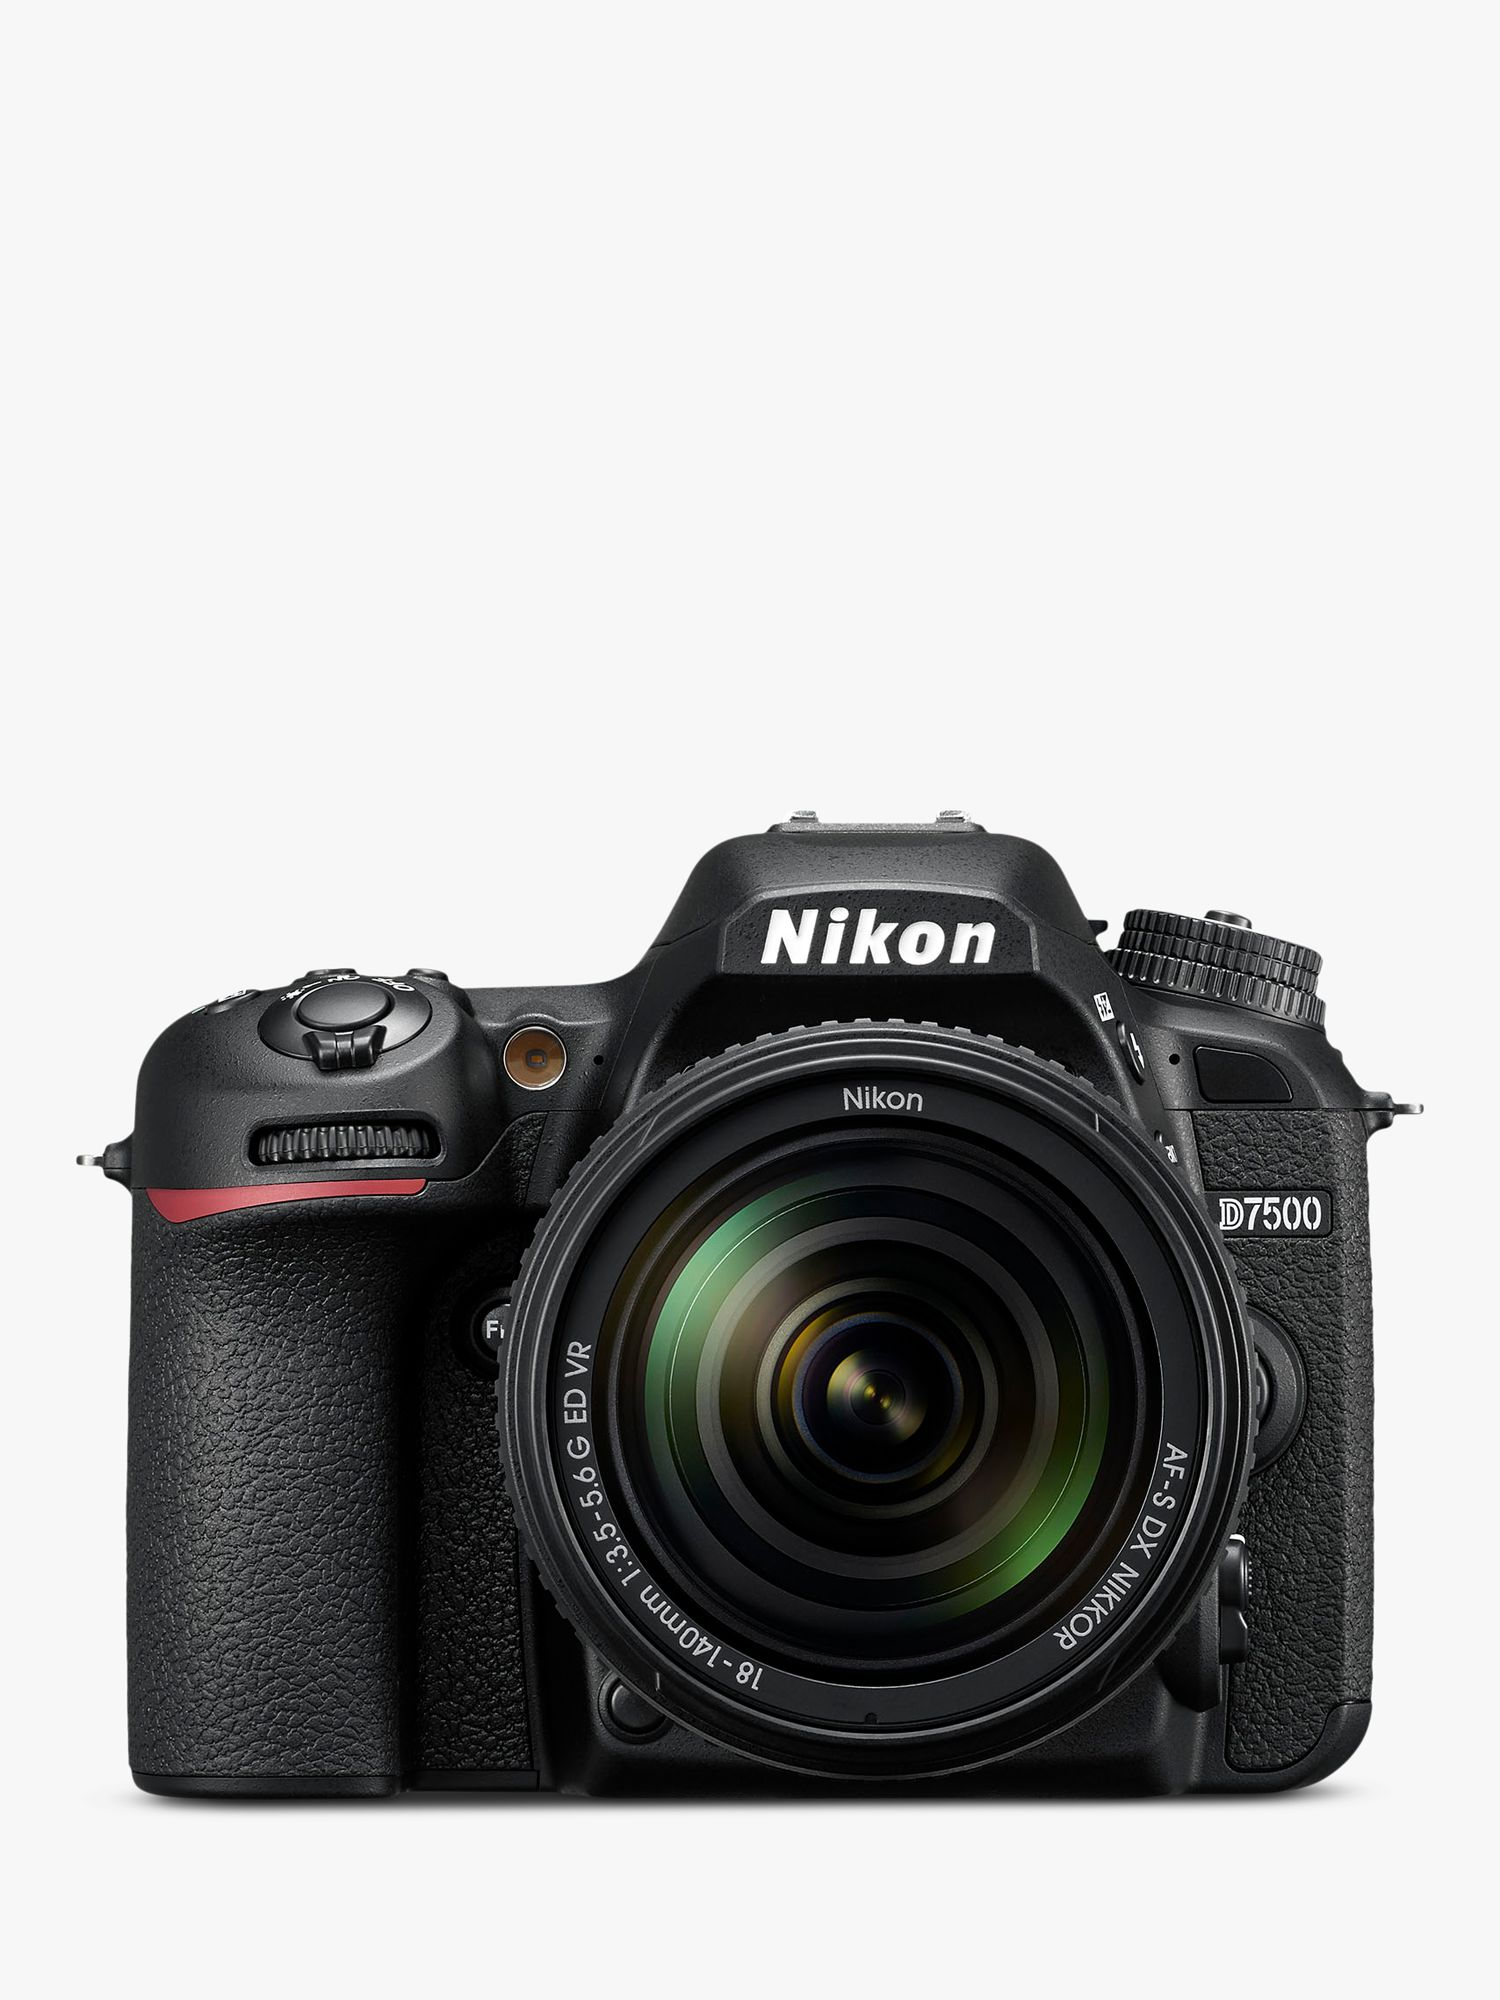 Nikon Nikon D7500 DSLR Camera with AF-S 18-140mm VR Lens, 20.9 MP, 4K UHD, Wi-Fi, Bluetooth, 3.2 Tiltable Touch Screen, Black